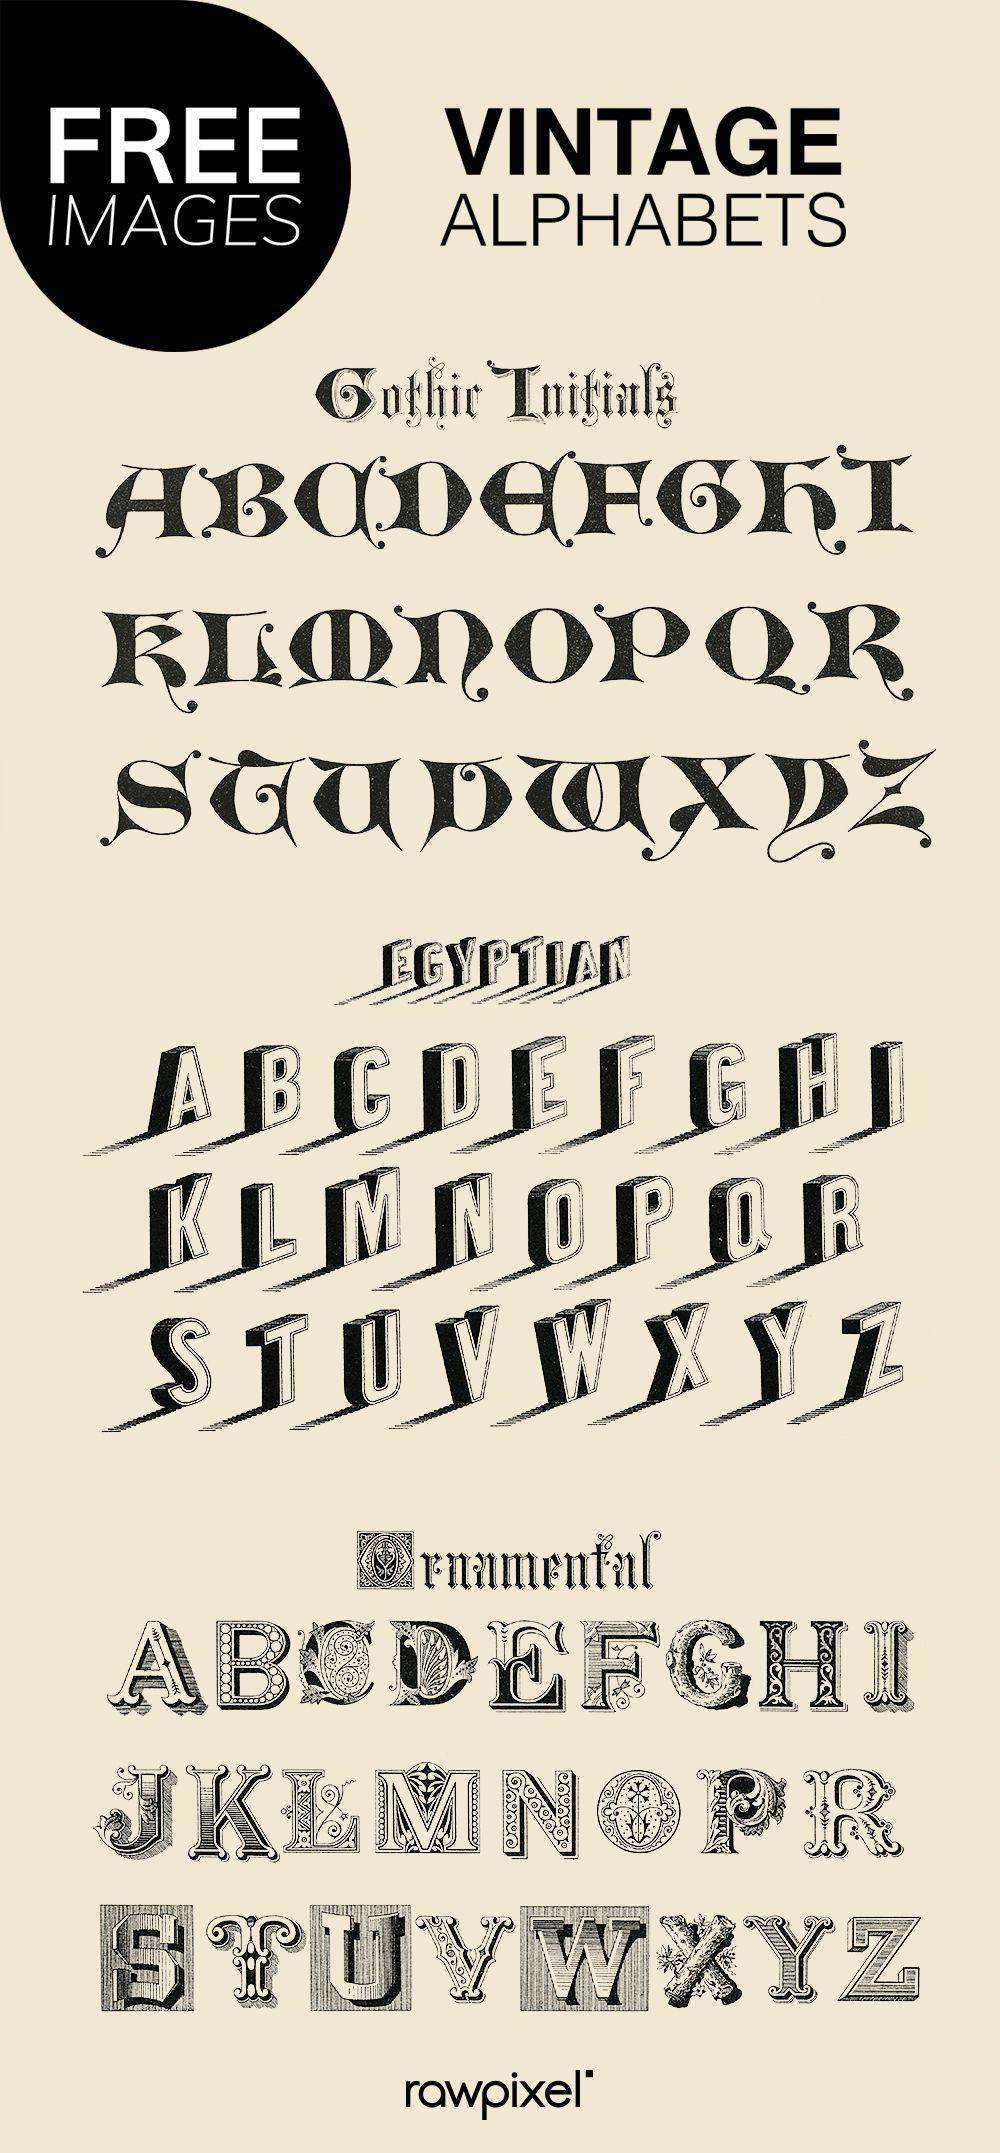 Download Free Vectors Of Vintage Fonts And Latin Alphabets At Rawpixel Com Web Layout Design Minimalist Web Design Simple Web Design